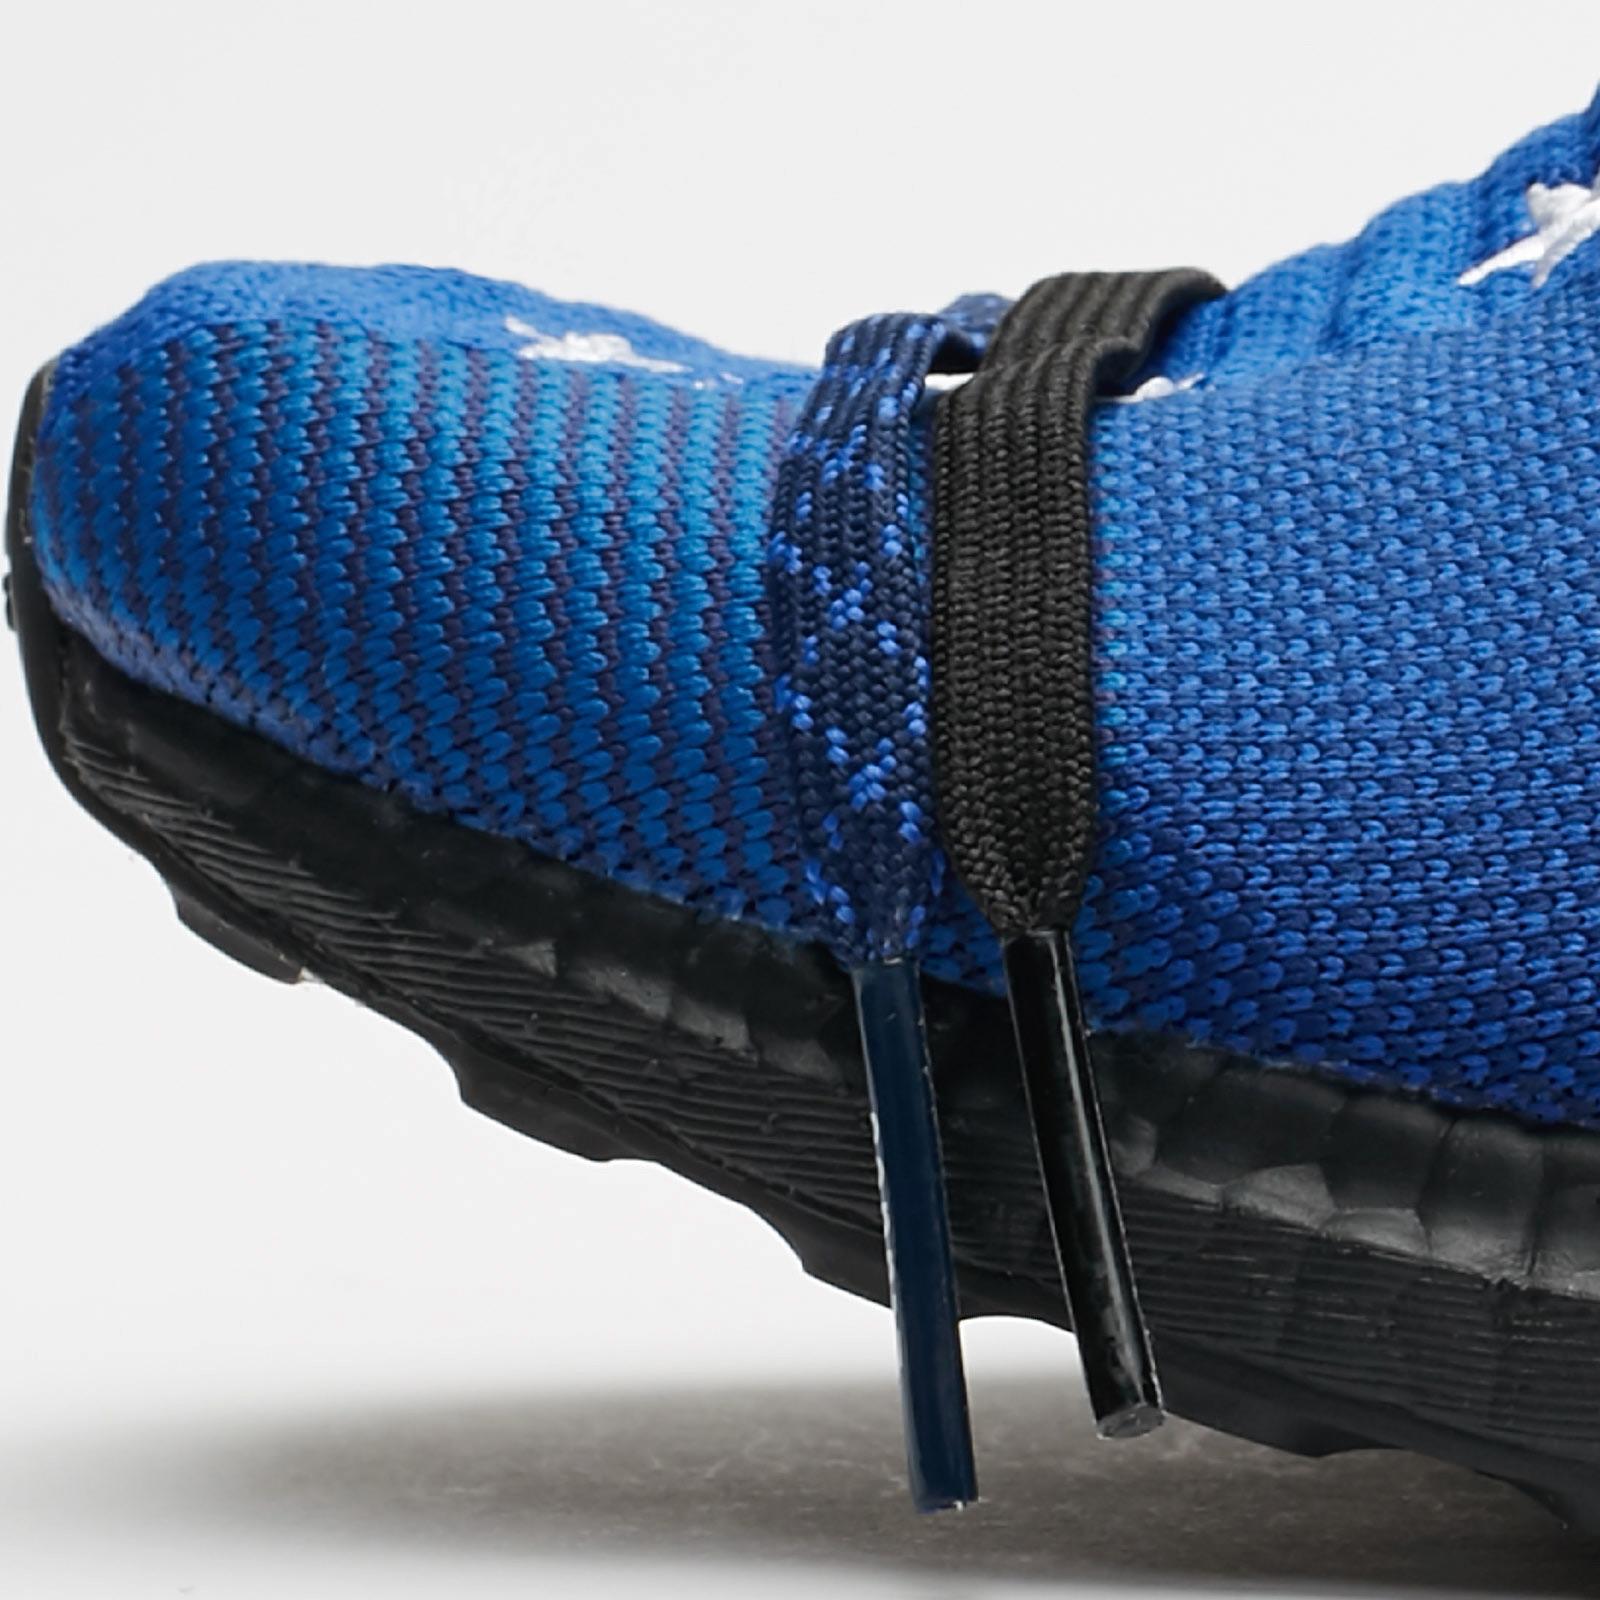 adidas UltraBOOST x Études - D97732 - Sneakersnstuff   sneakers ... 2ab8d9c4bf88